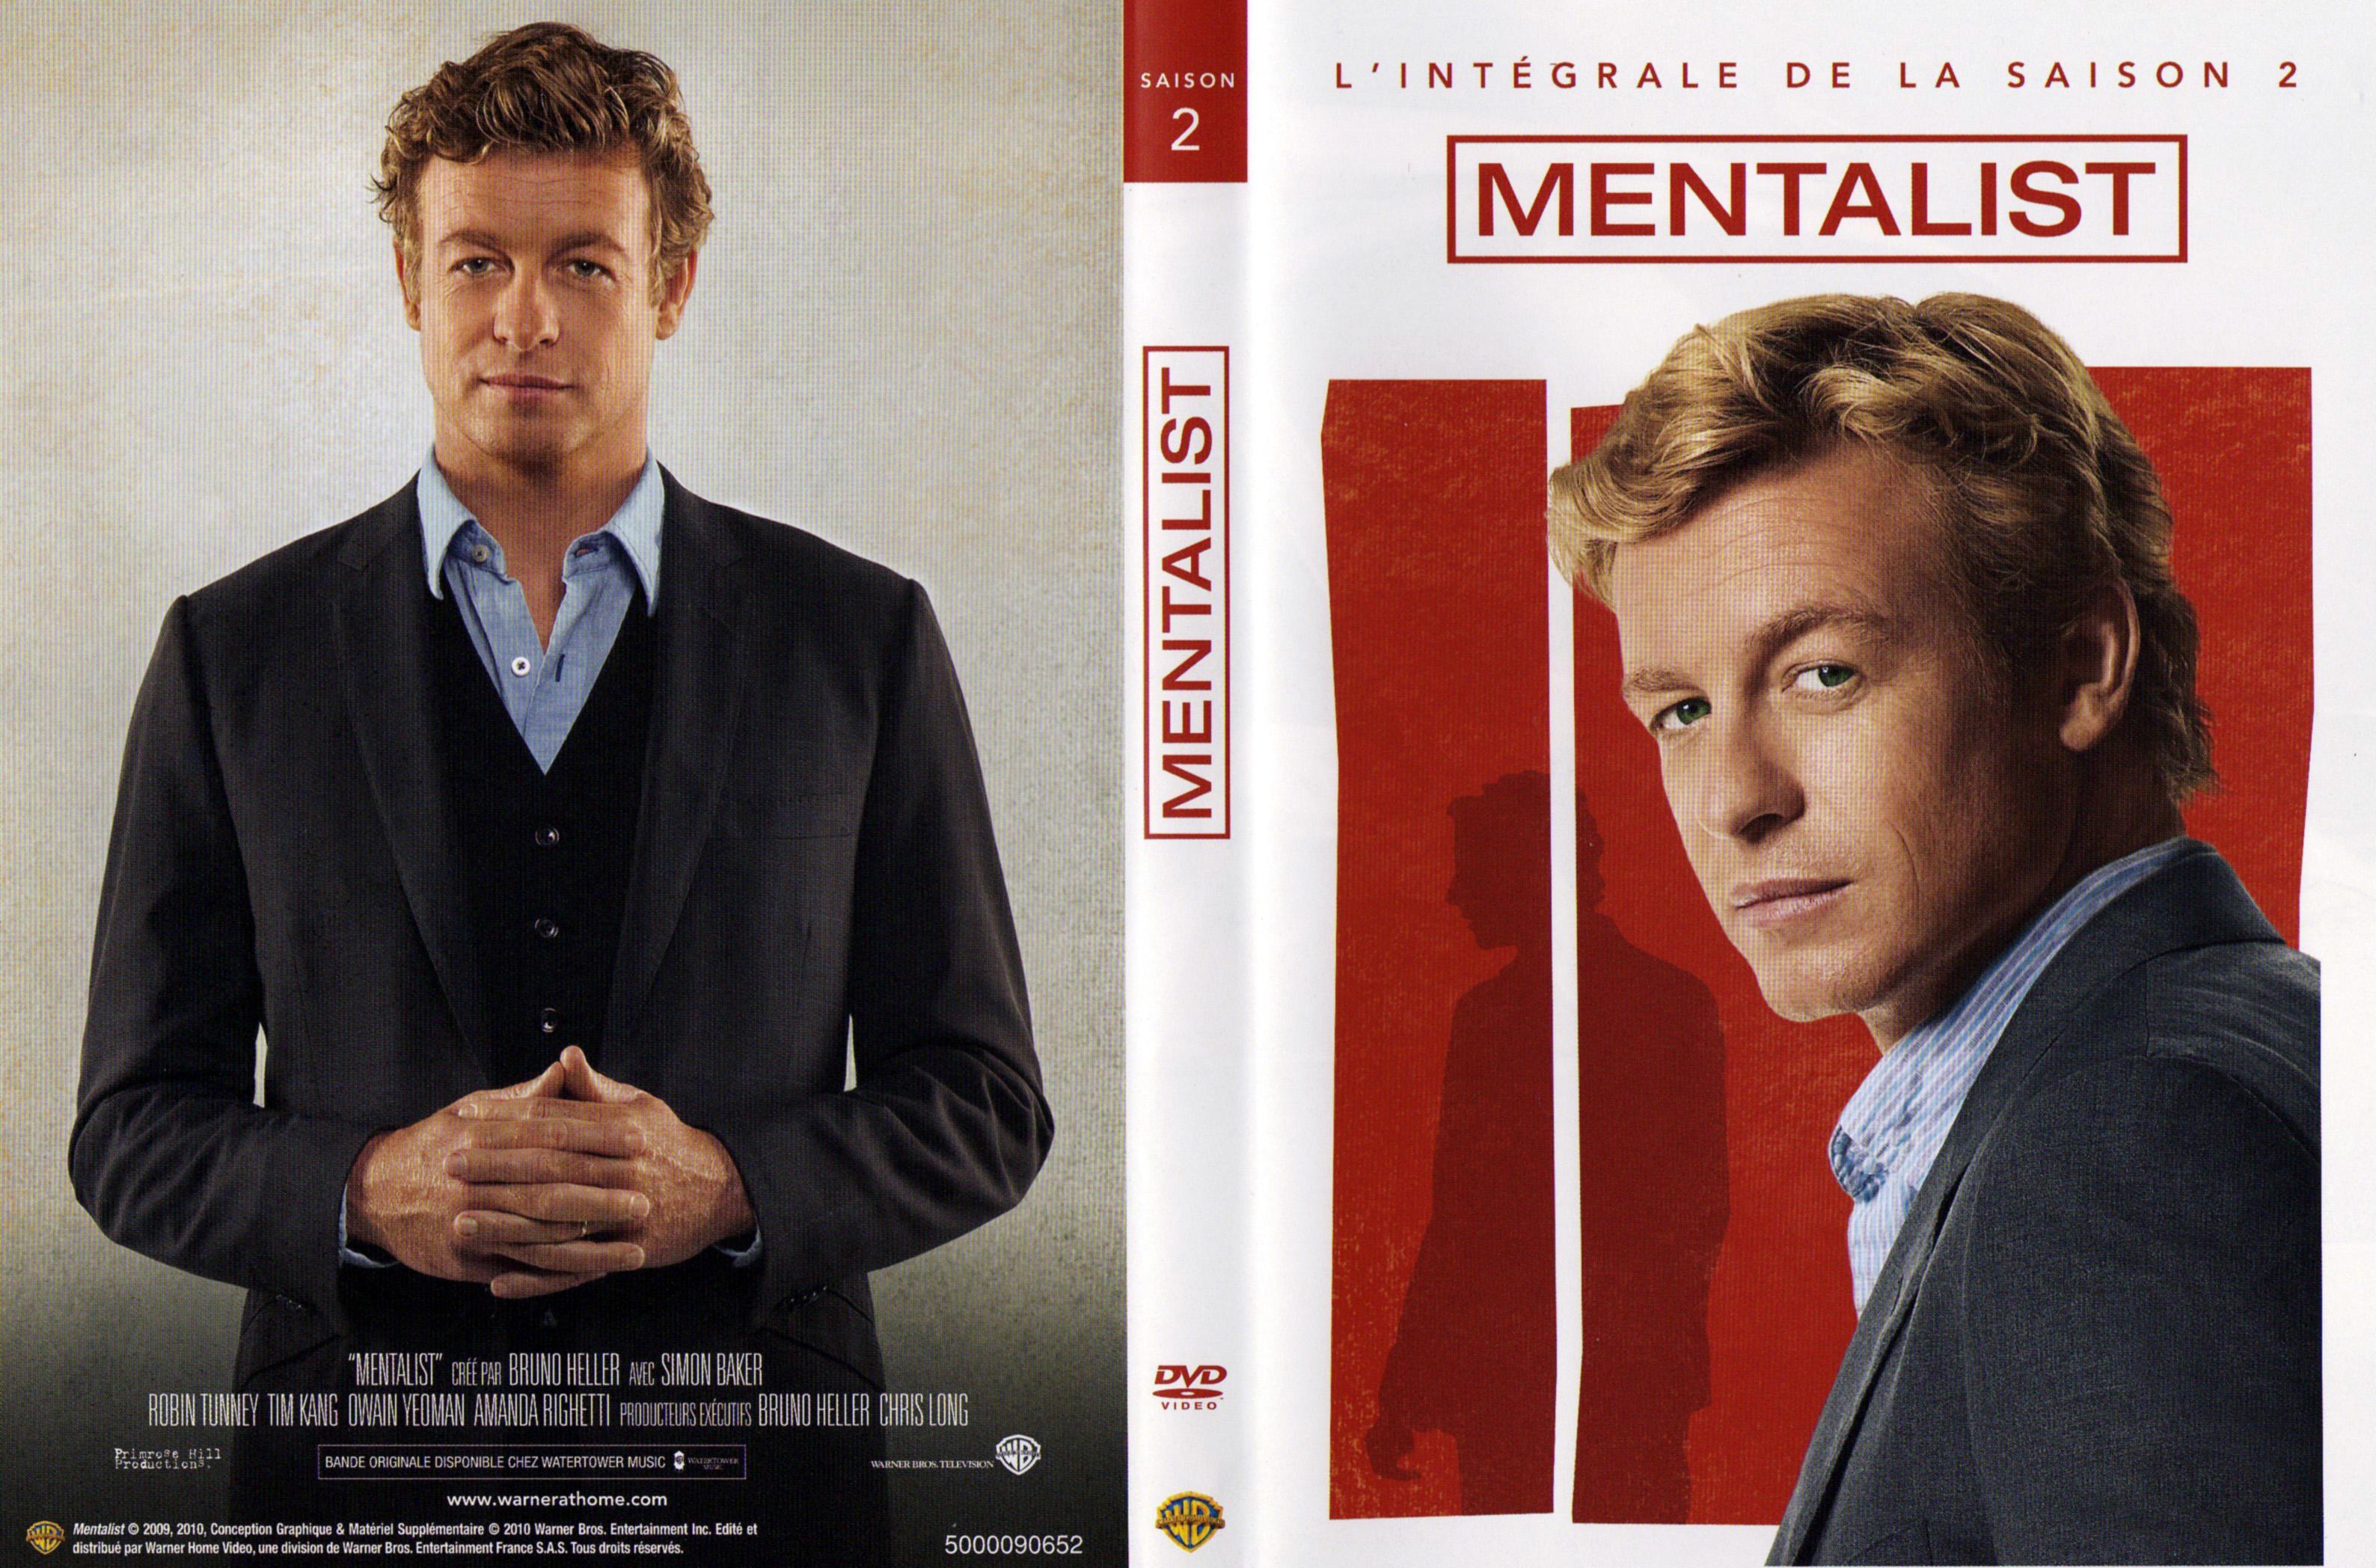 the mentalist saison 2 مترجم عربي The_mentalist_Saison_2-14023431122010